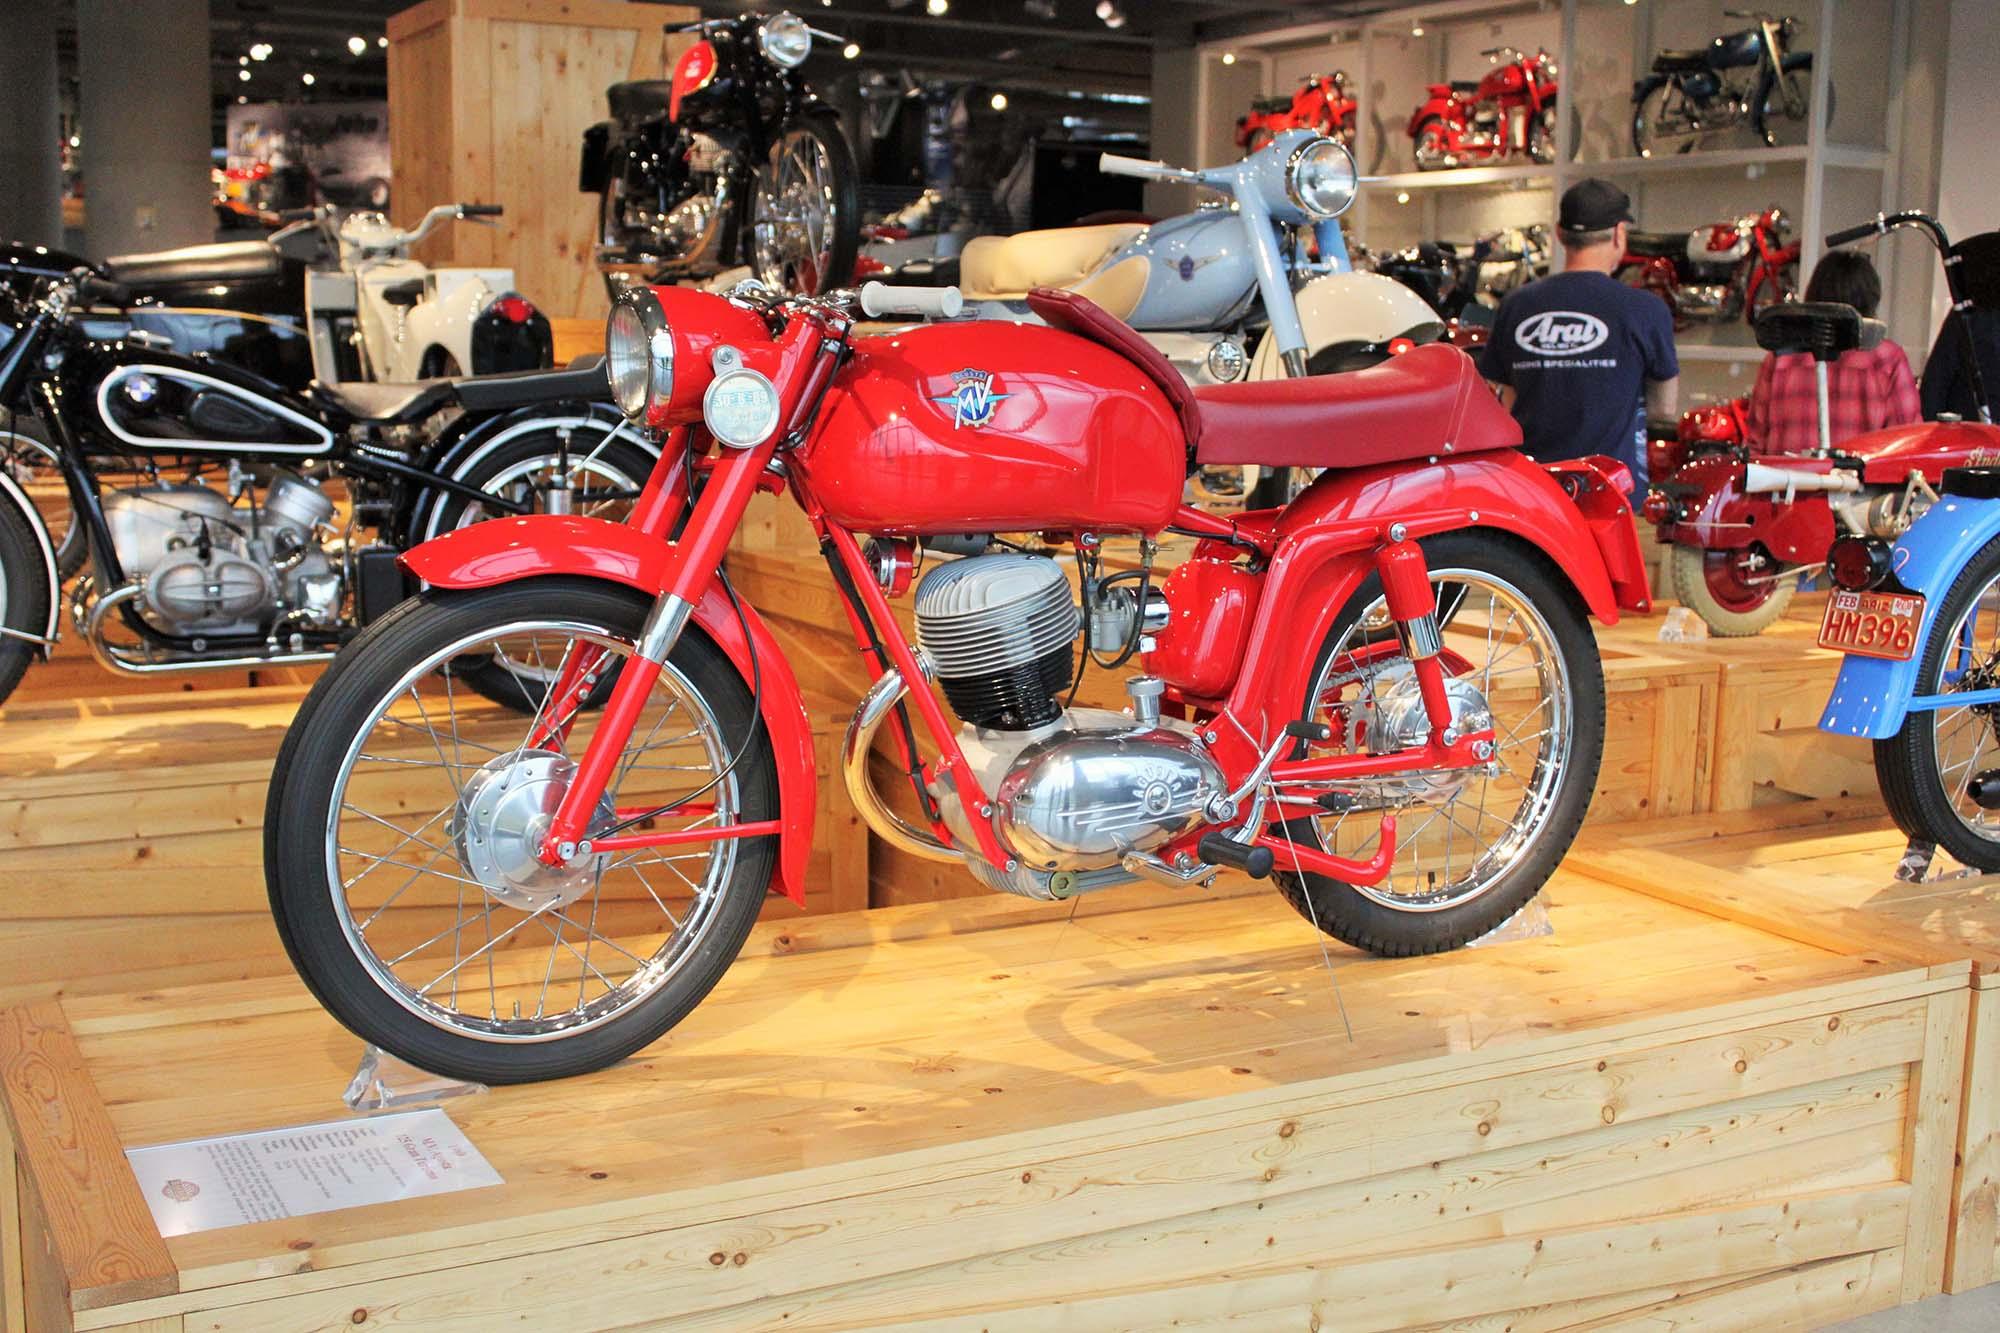 At the Barber Vintage Motorsports Museum